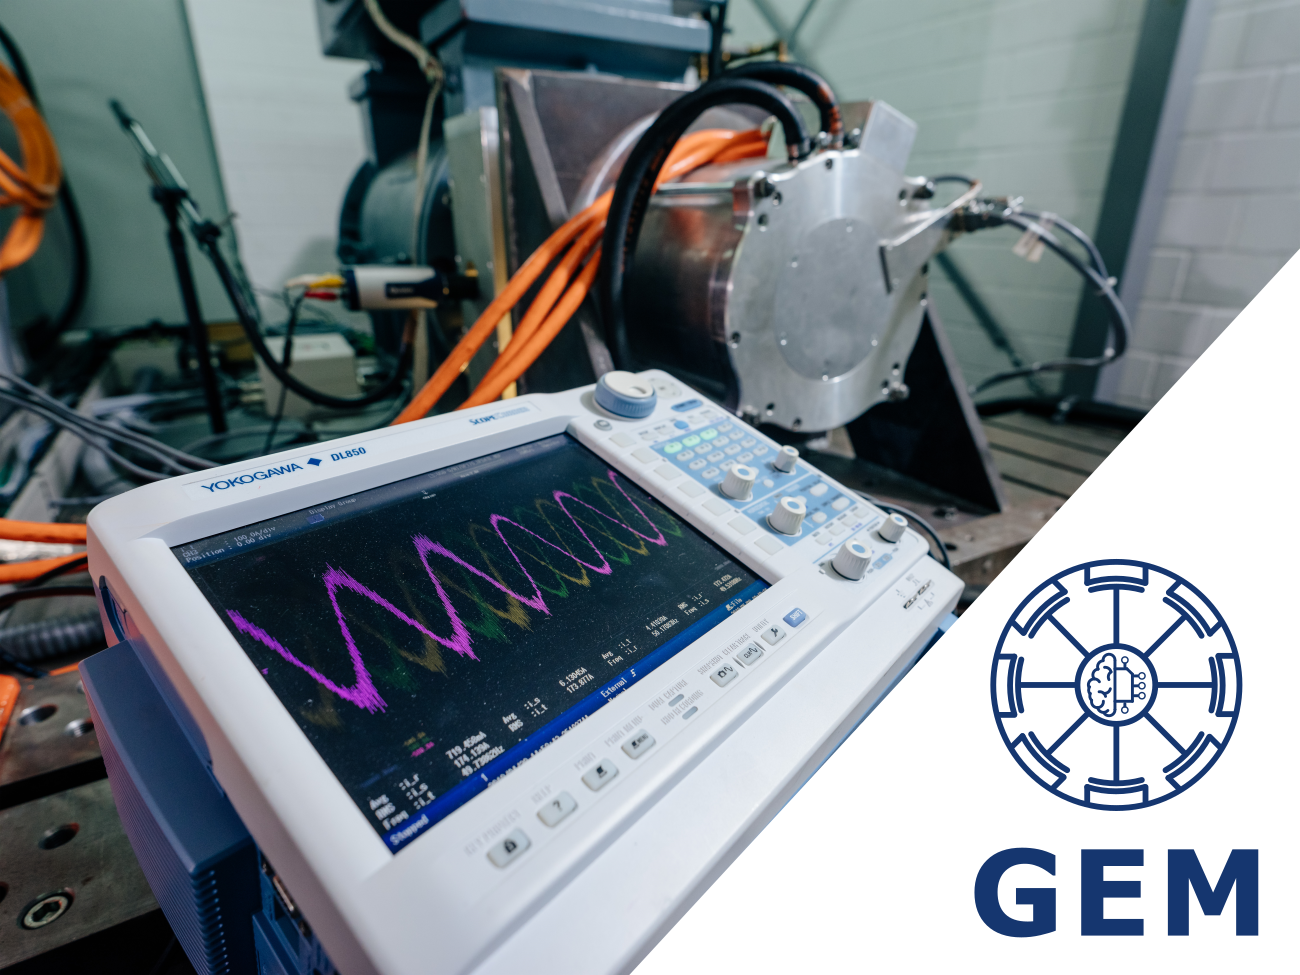 Gym Electric Motor (GEM) - 強化学習環境の紹介⑭